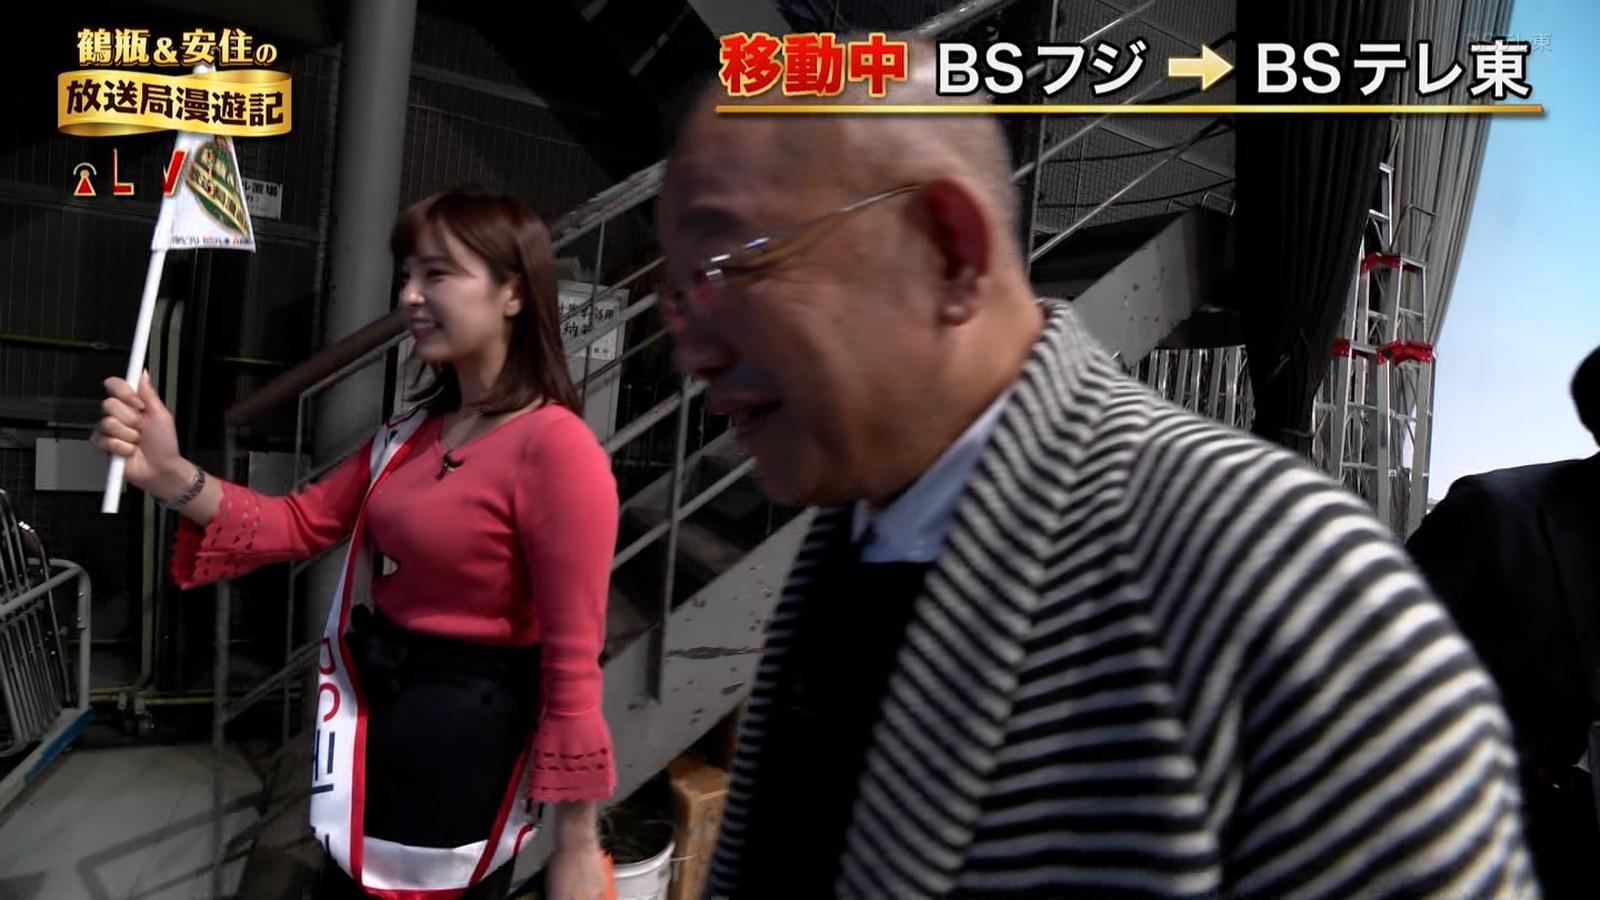 角谷暁子_女子アナ_着衣巨乳_鶴瓶&安住の放送局漫遊記_06